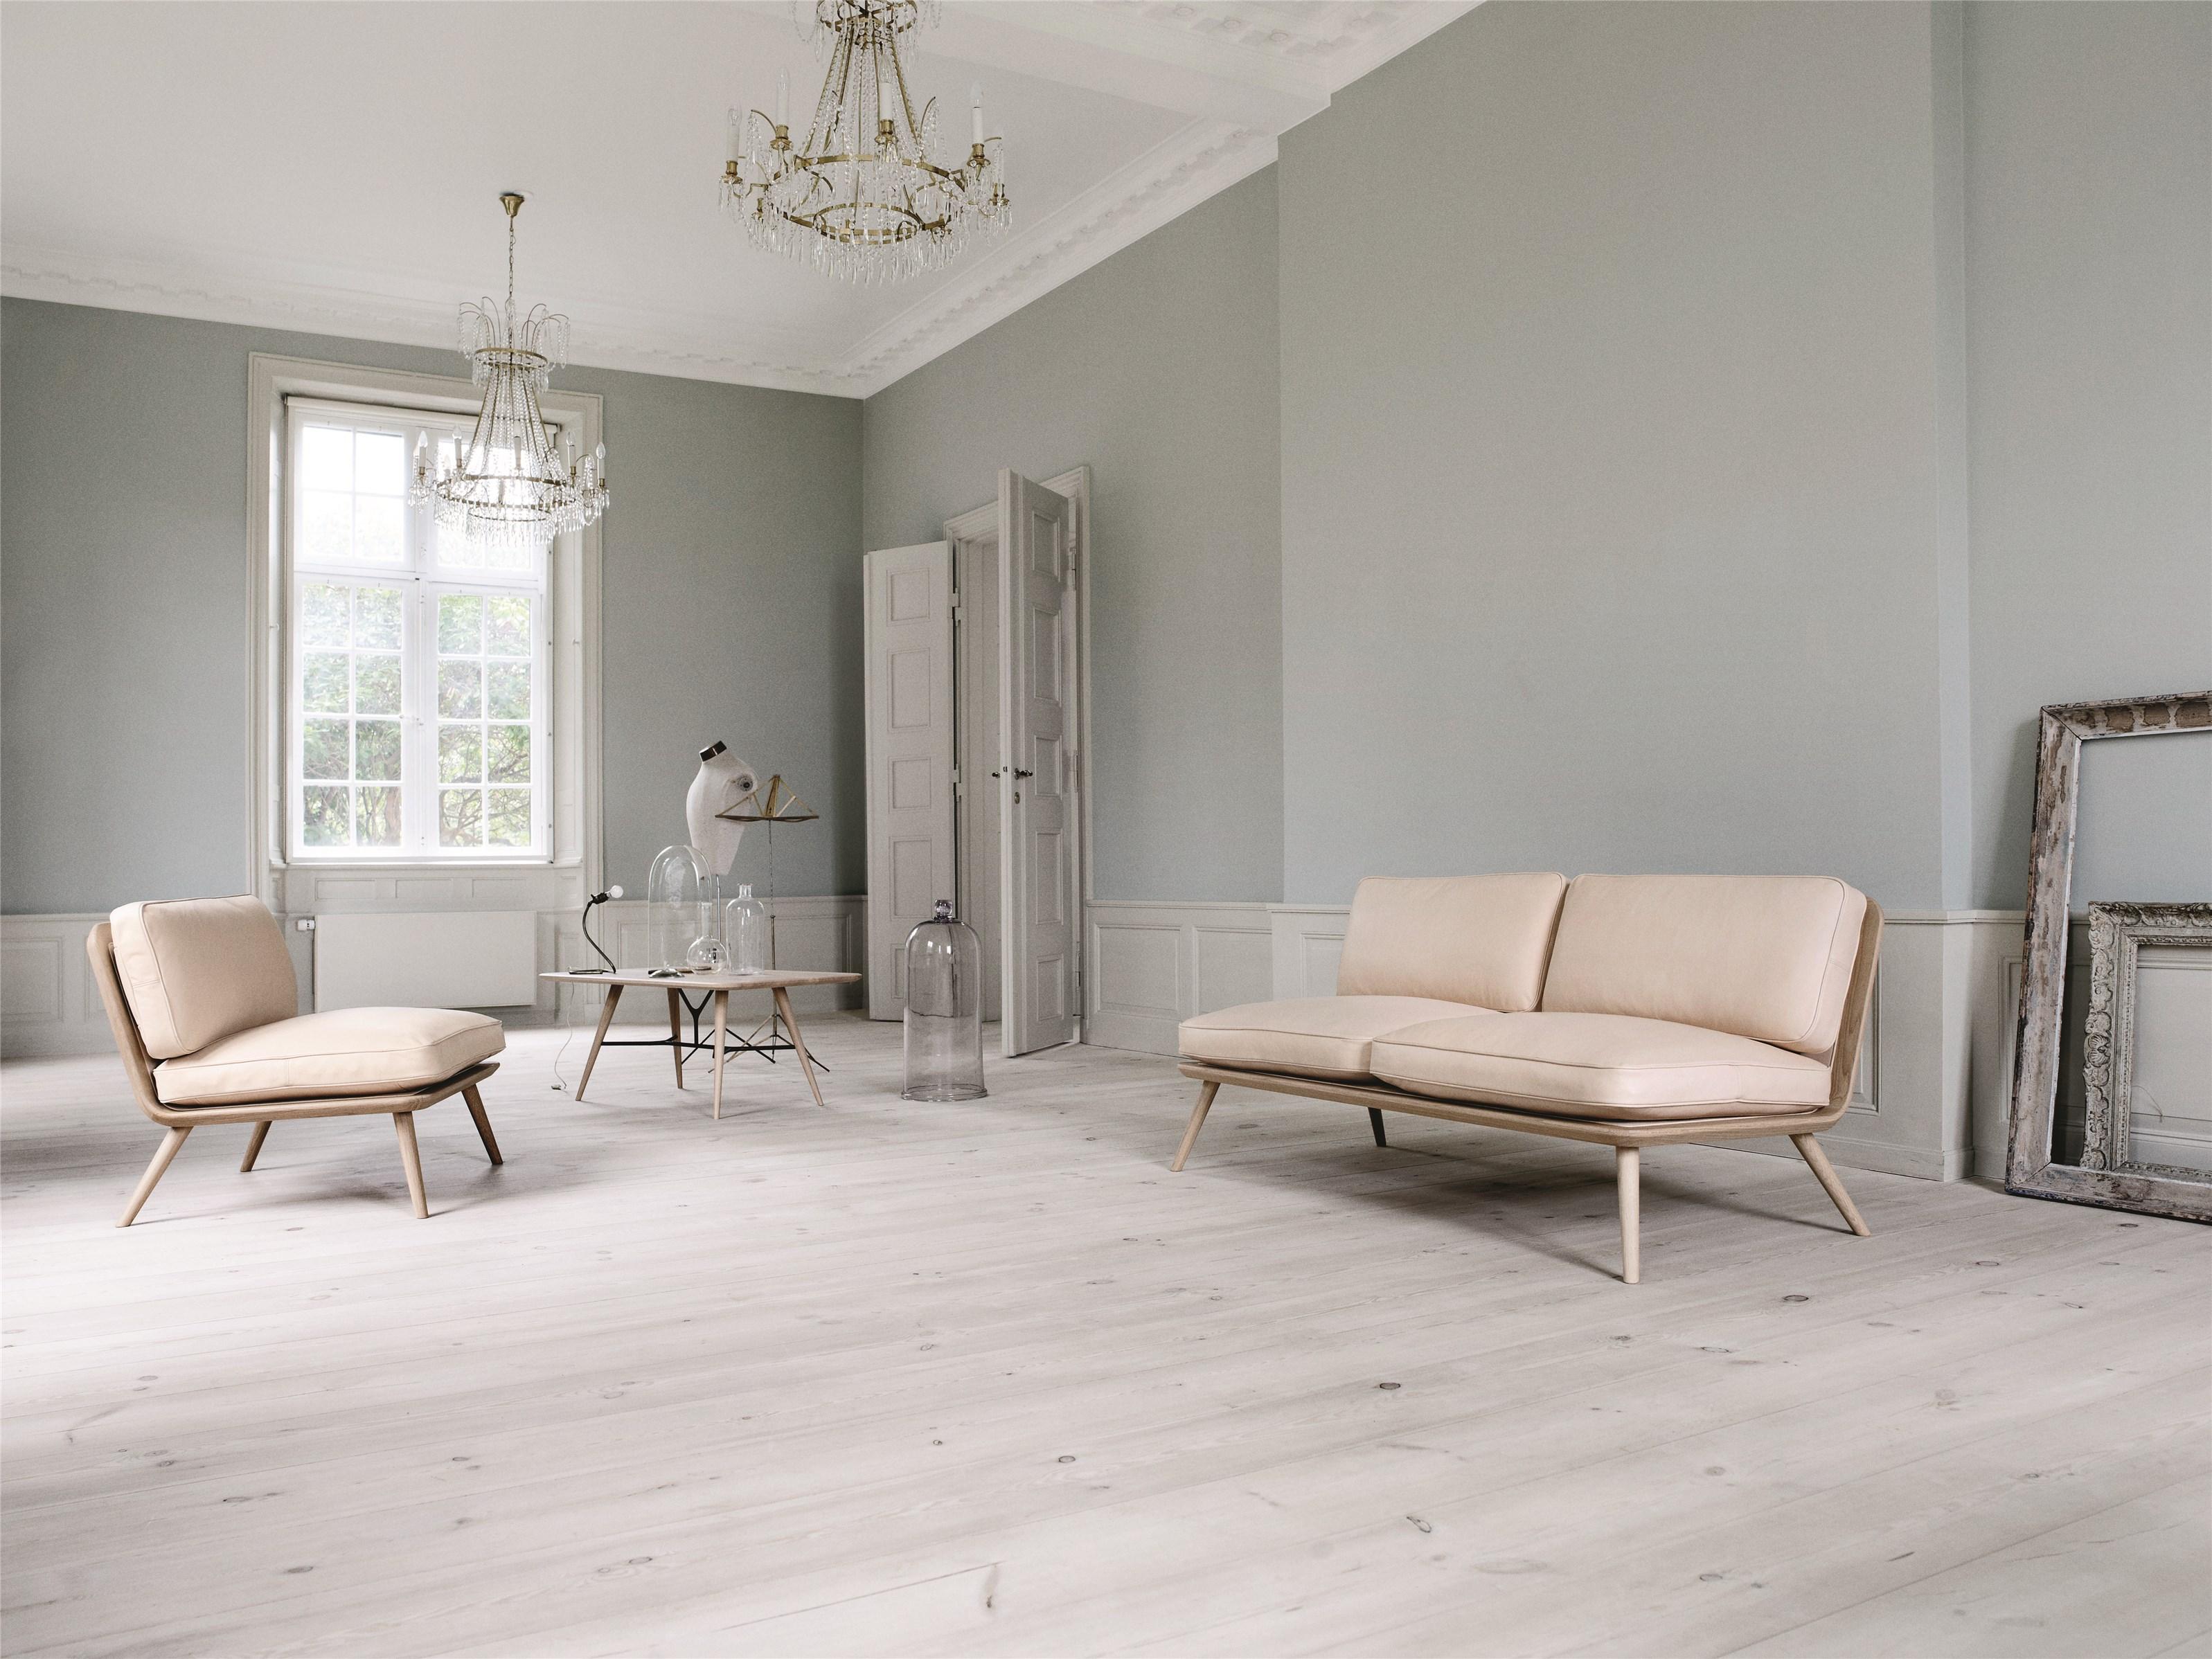 Journelles Maison Best Of Scandinavian Interior Design  Fredericia Furniture 3